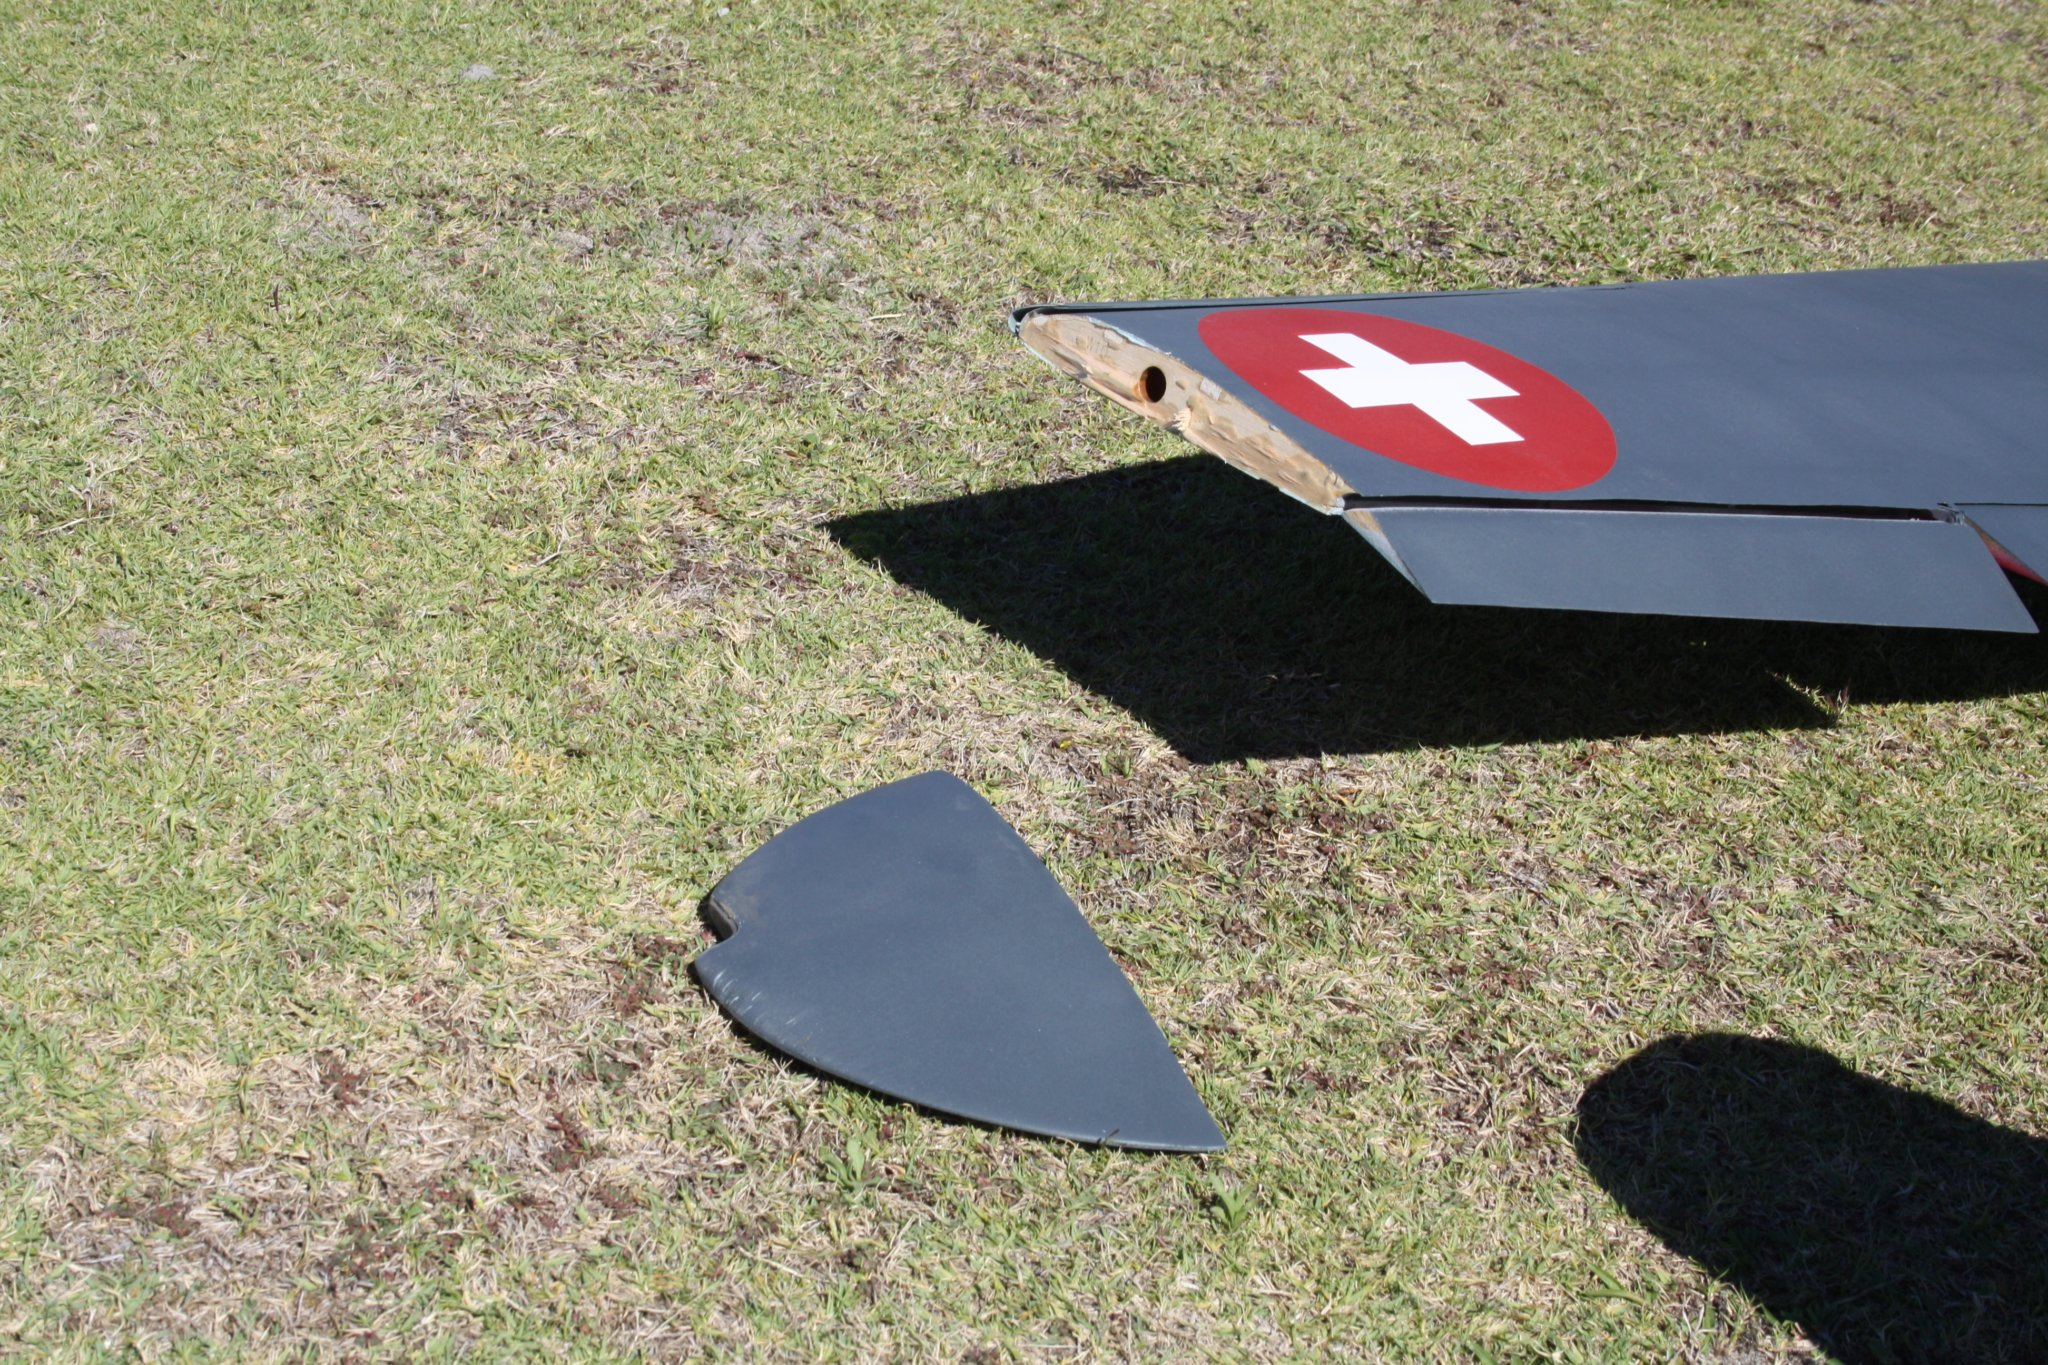 Click image for larger version  Name:2015_01_11 04 Test flight damage.JPG Views:291 Size:826.9 KB ID:2062883